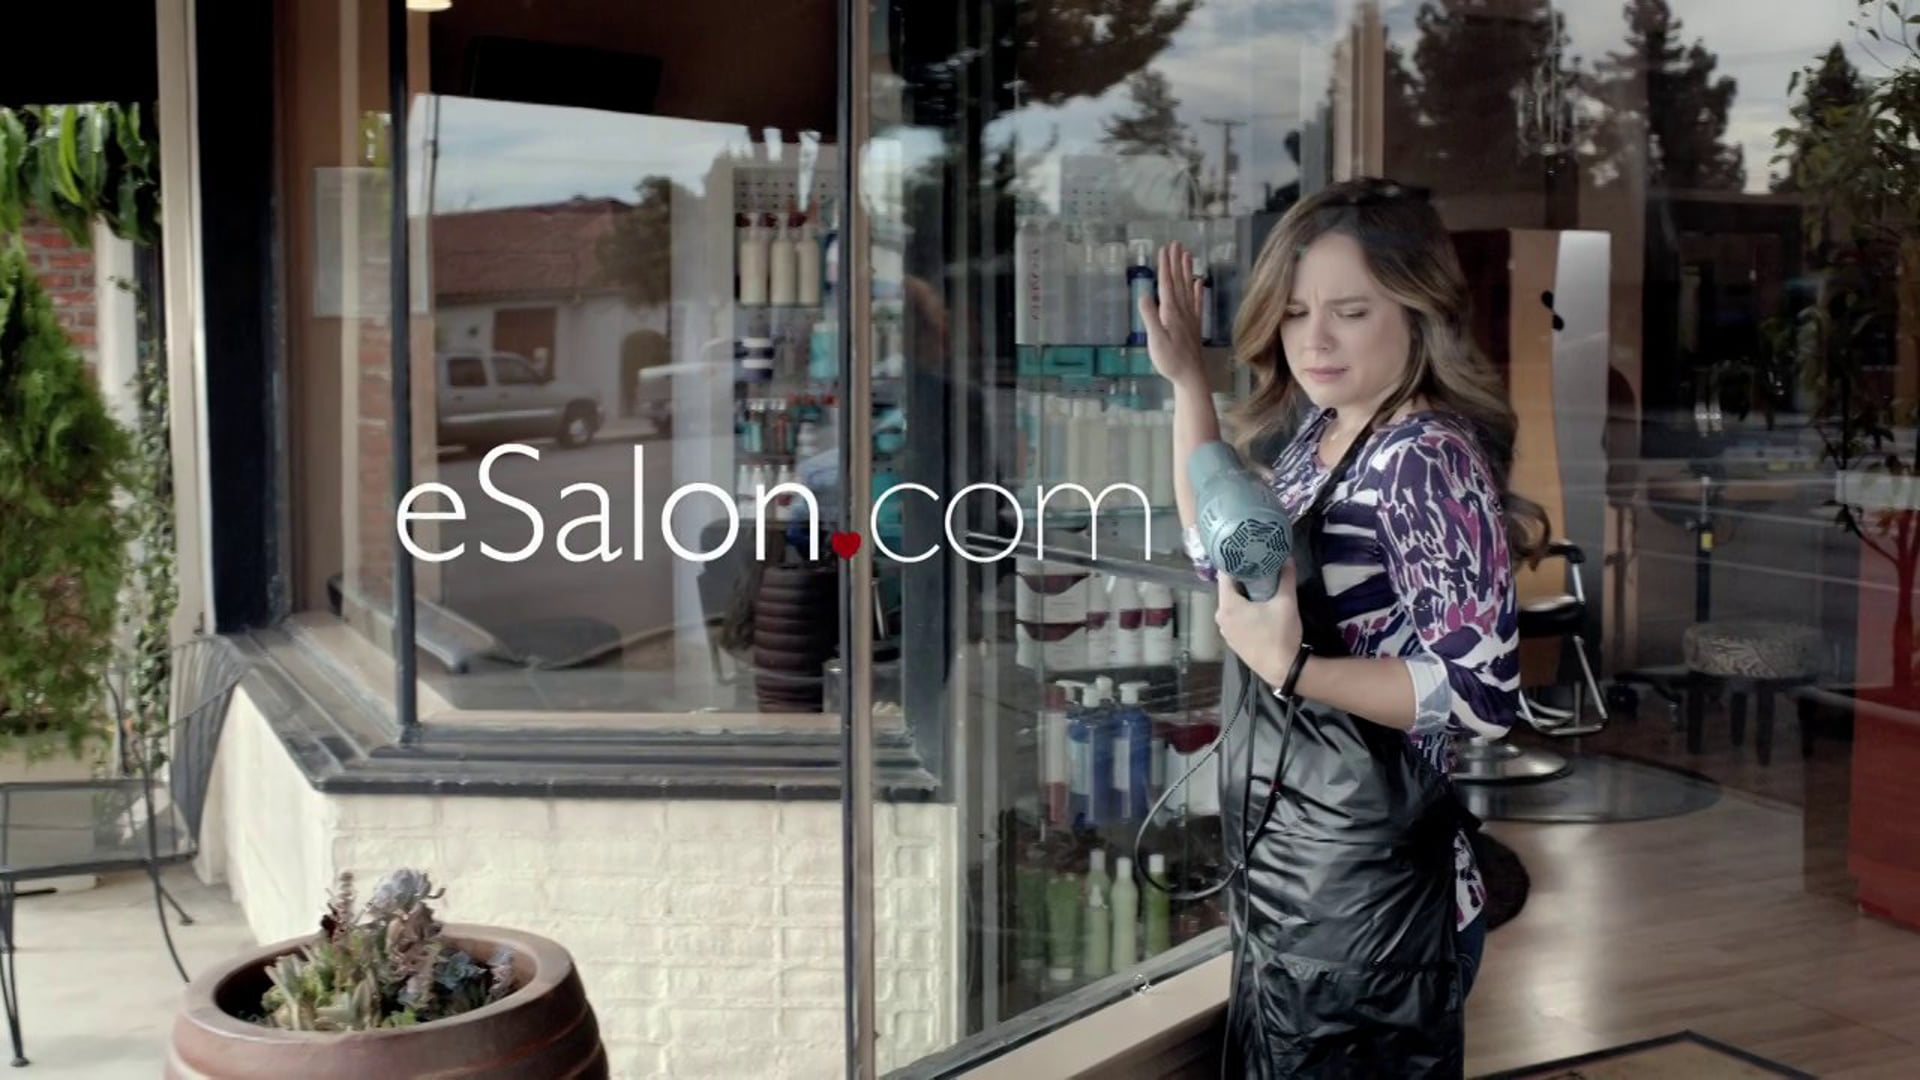 eSalon - The Ex